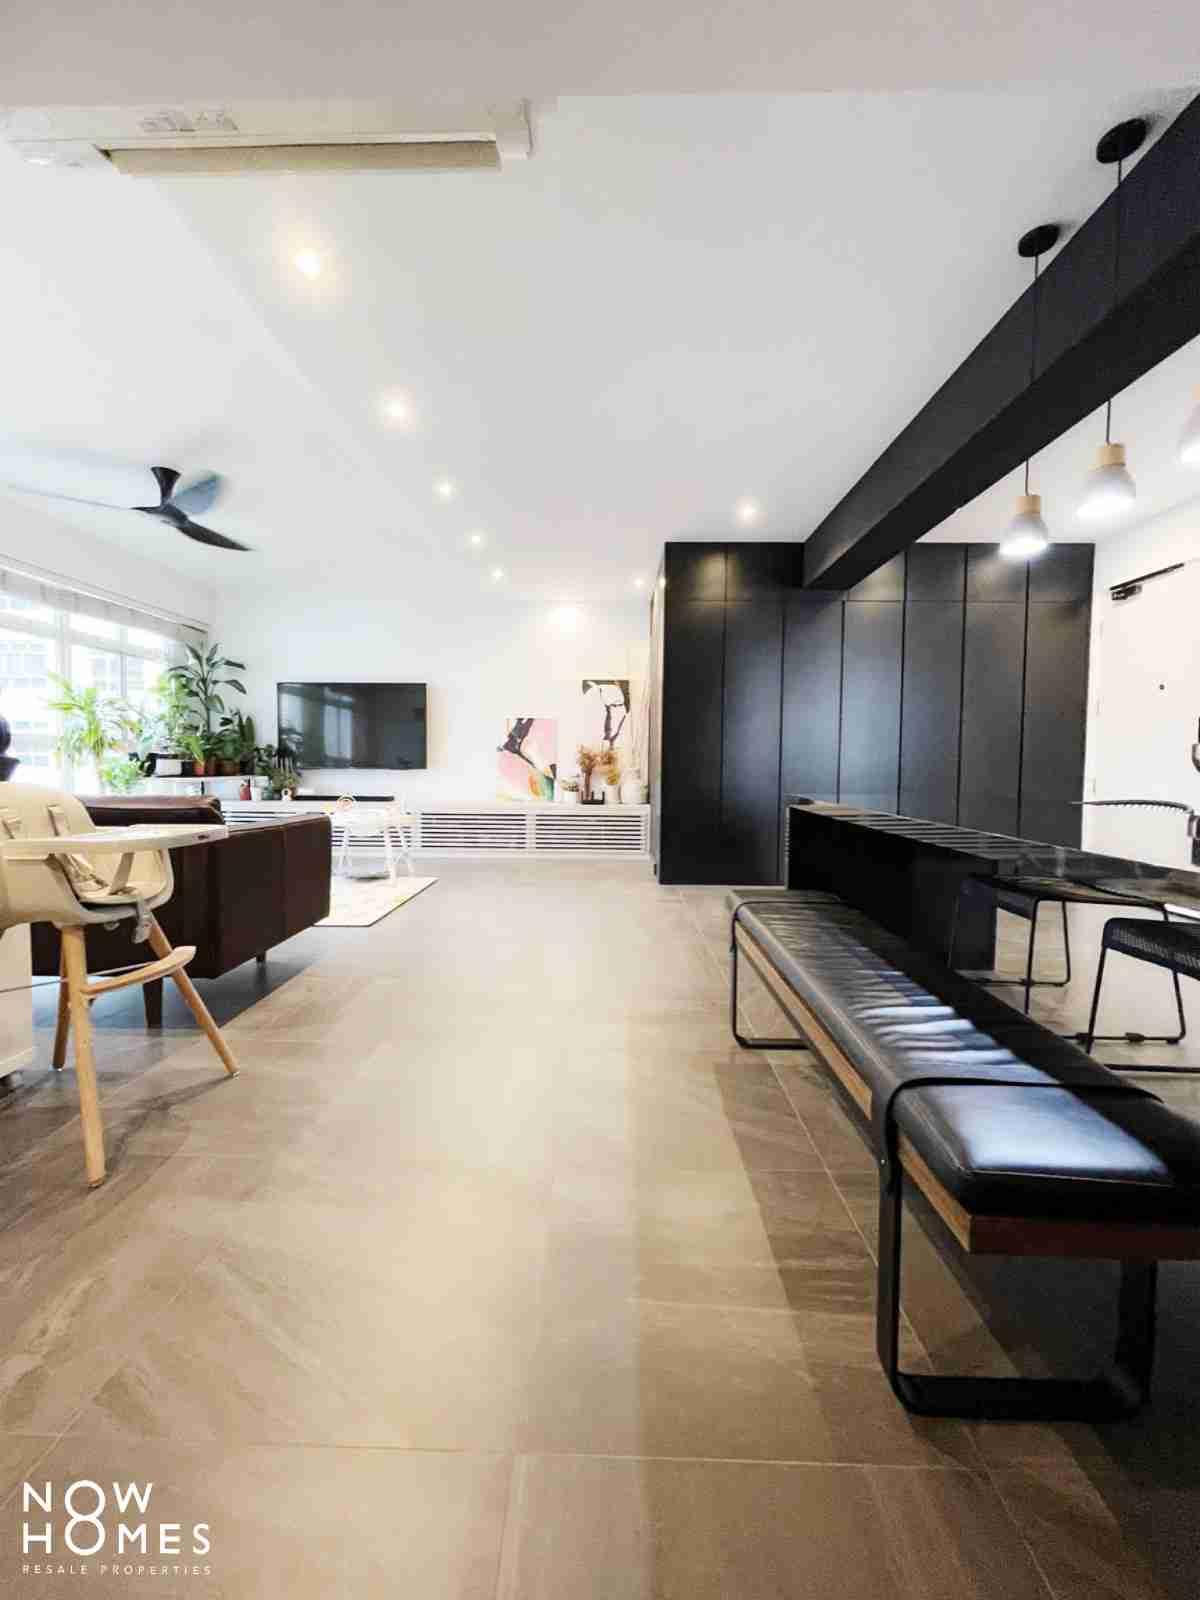 sengkang resale property - 288 compassvale - Living Room app view